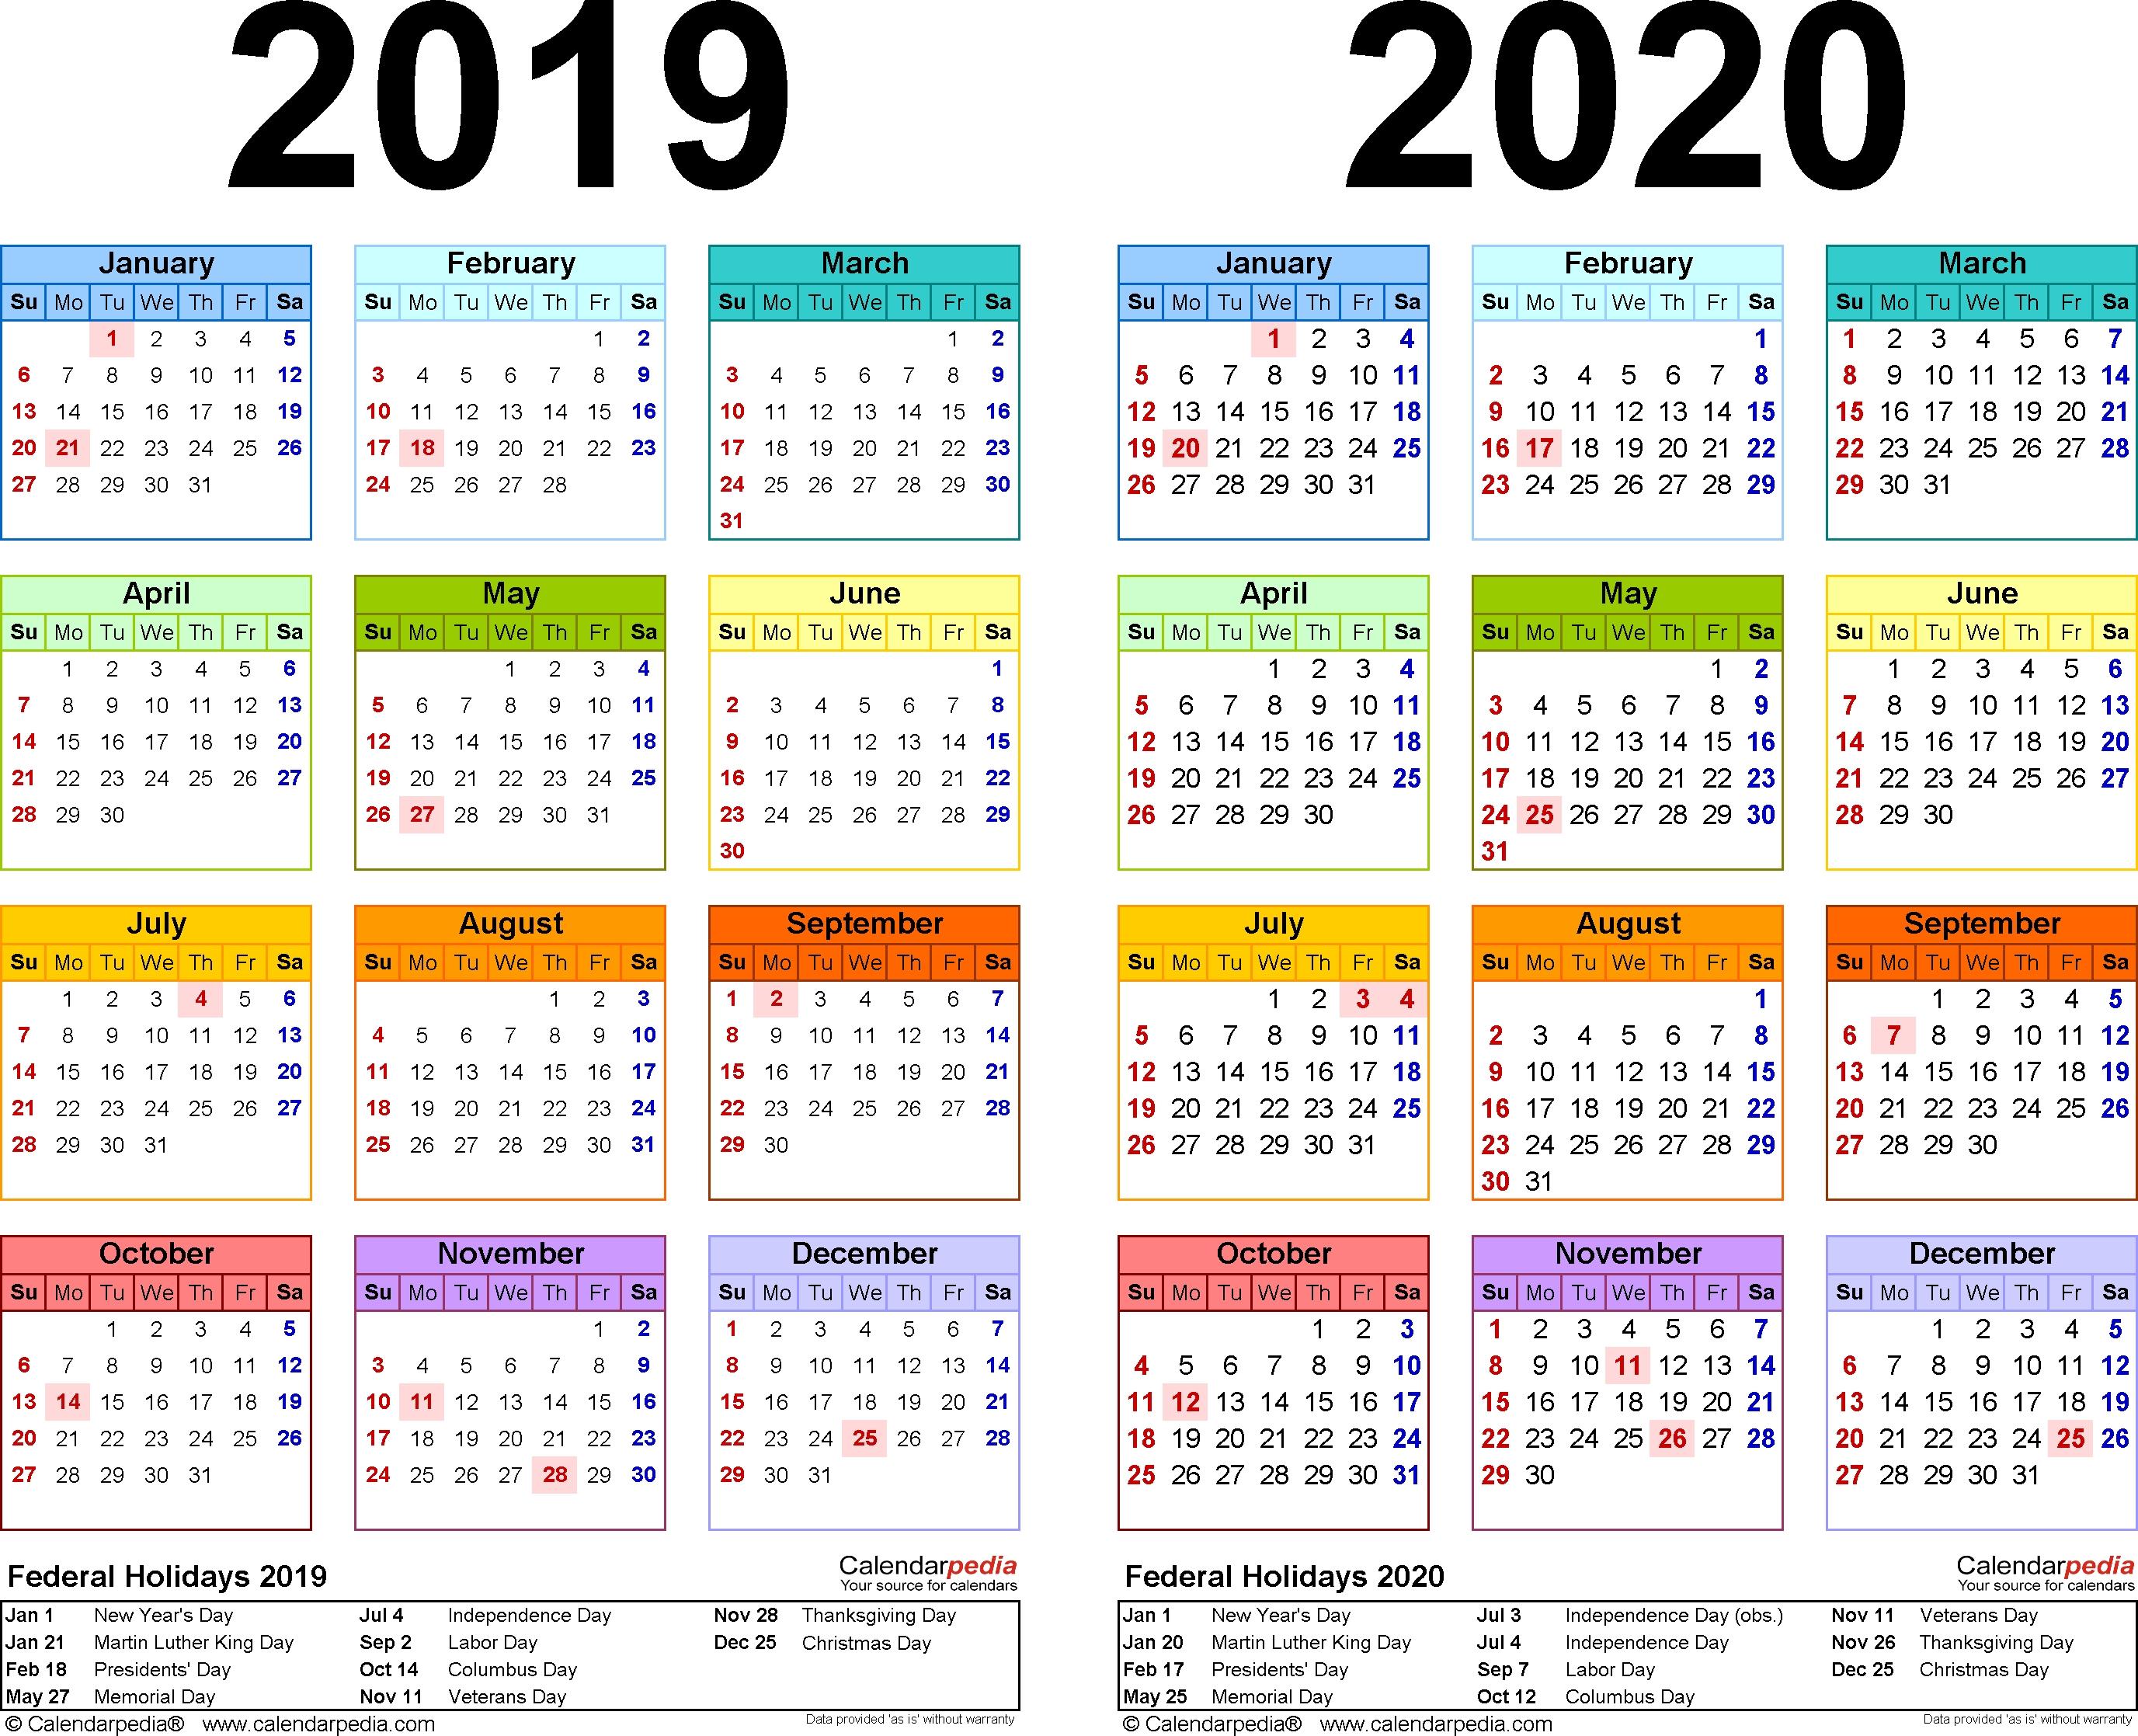 2019 2020 School Year Calendar With Holiday Us - Google-Calendar 2020 Holidays Us